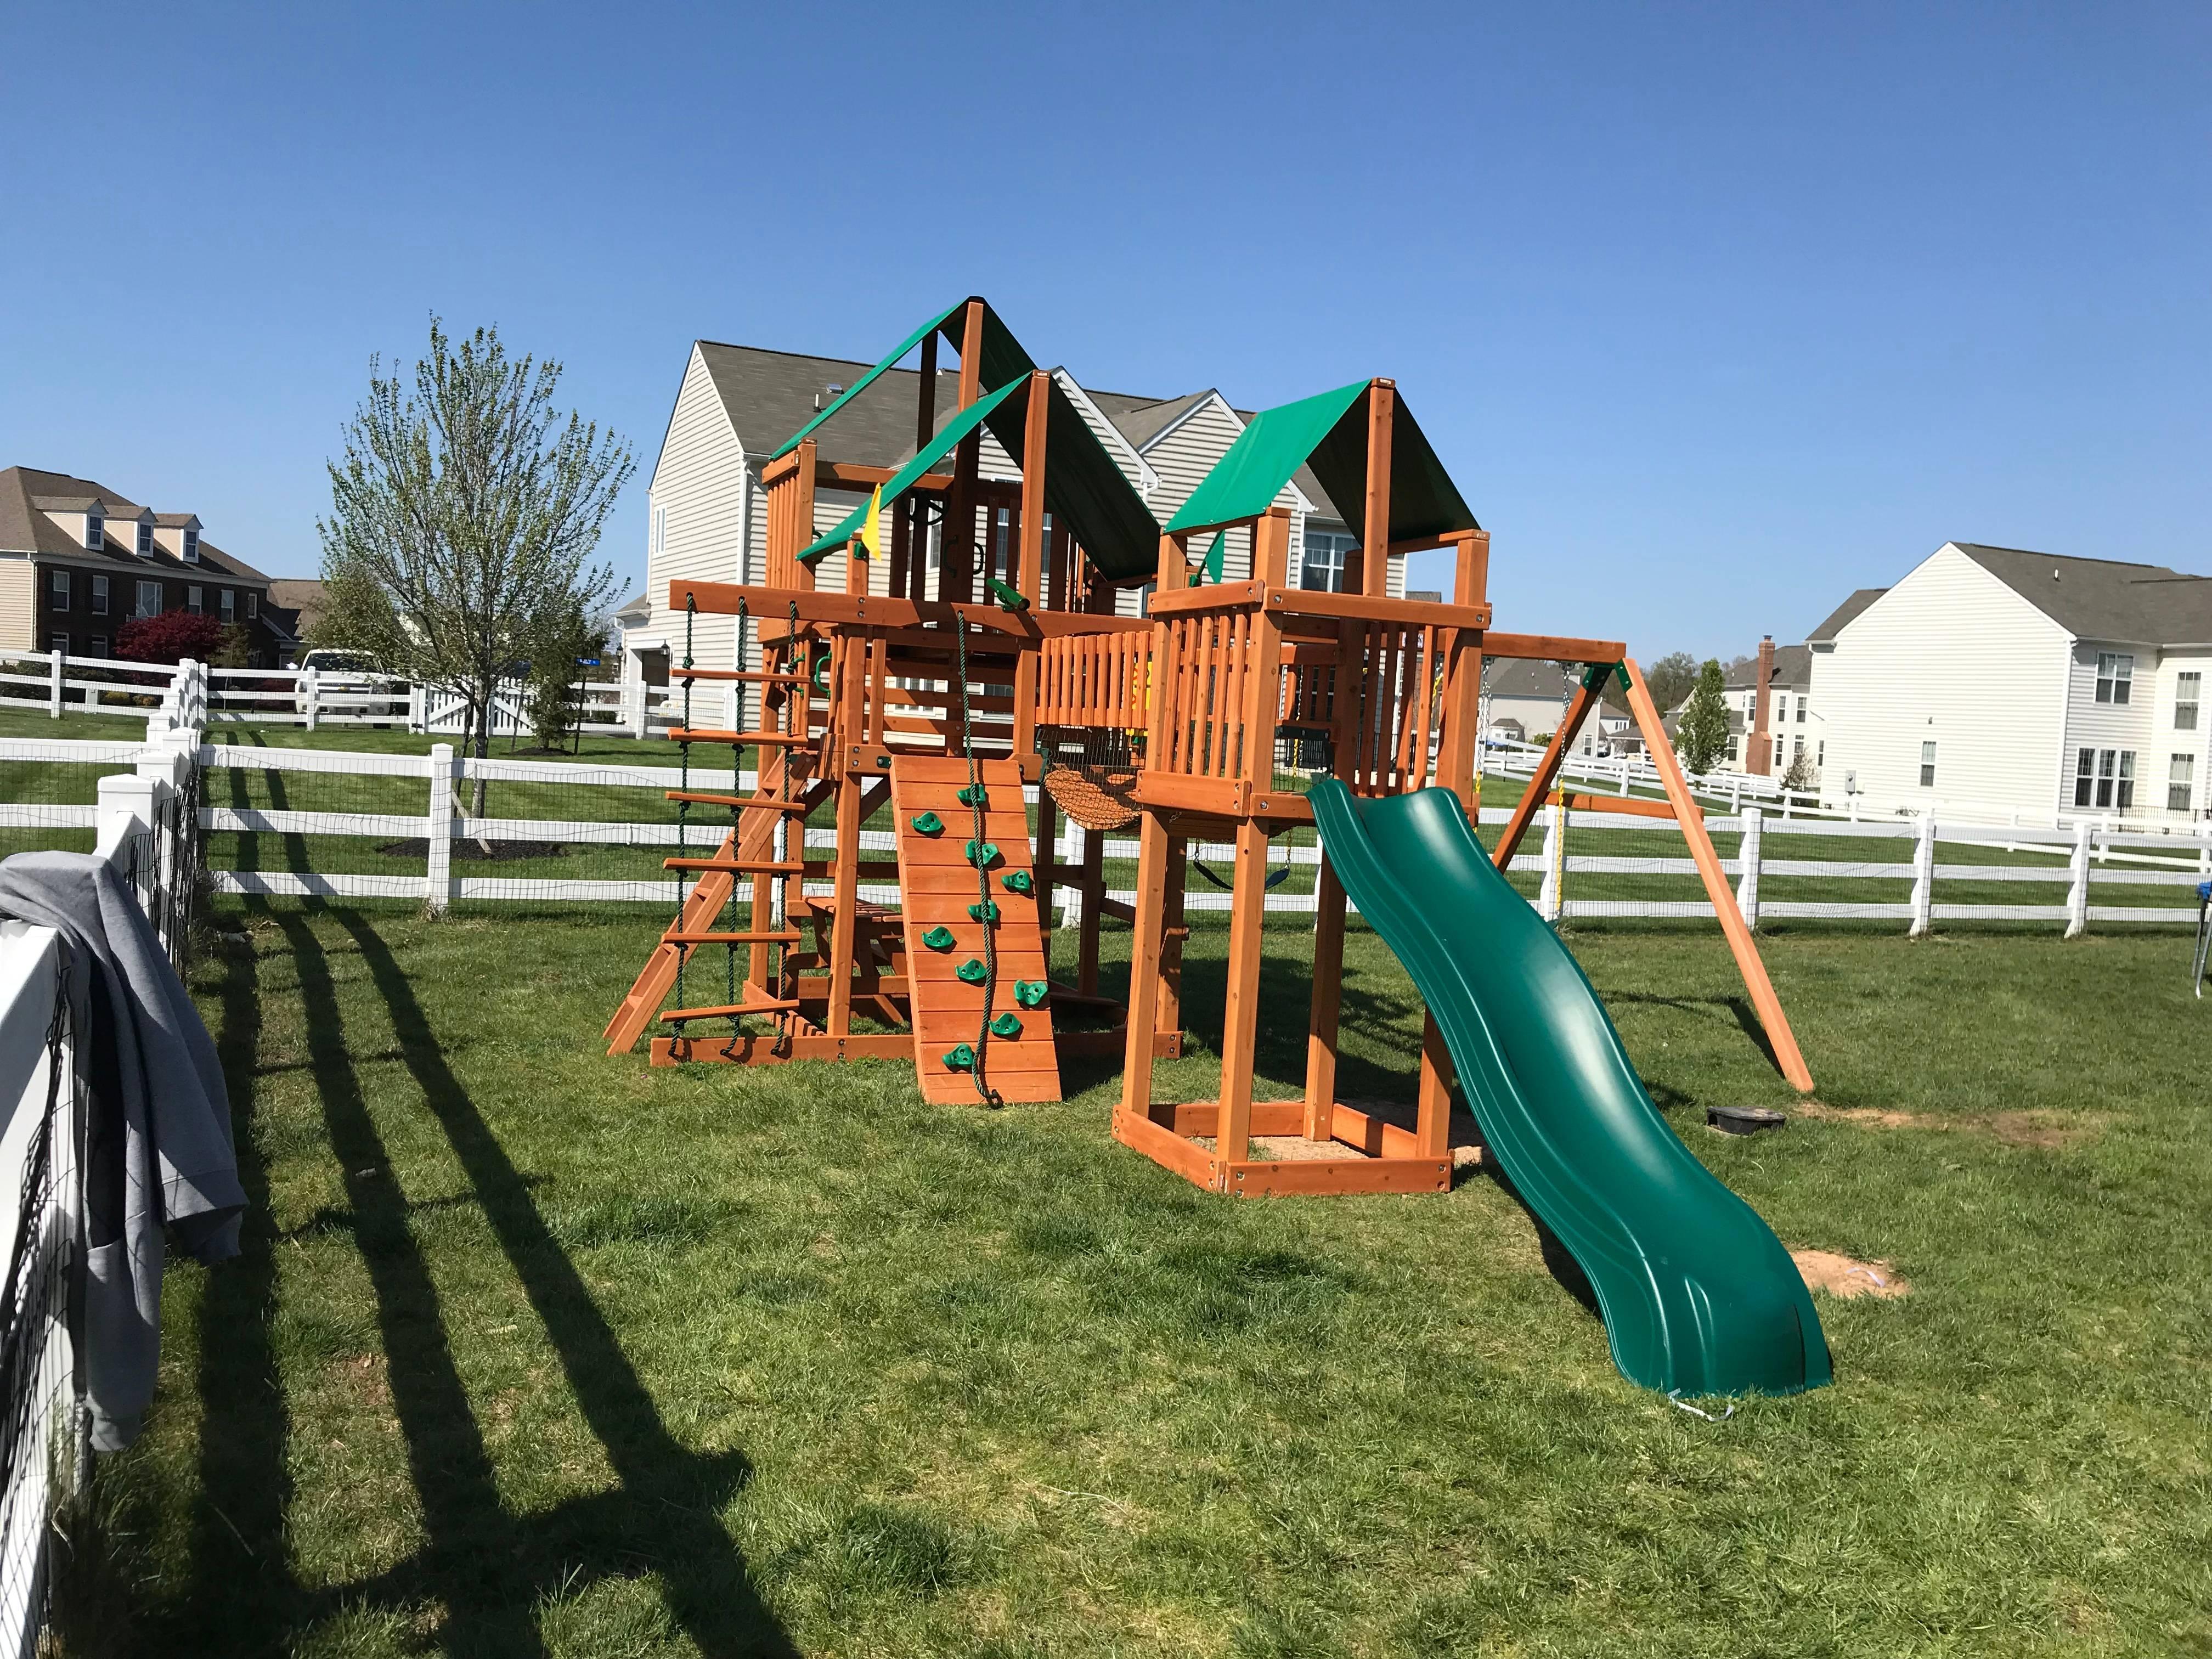 Gorilla treasure trove 1 cedar swing set installation in fairfax Virginia